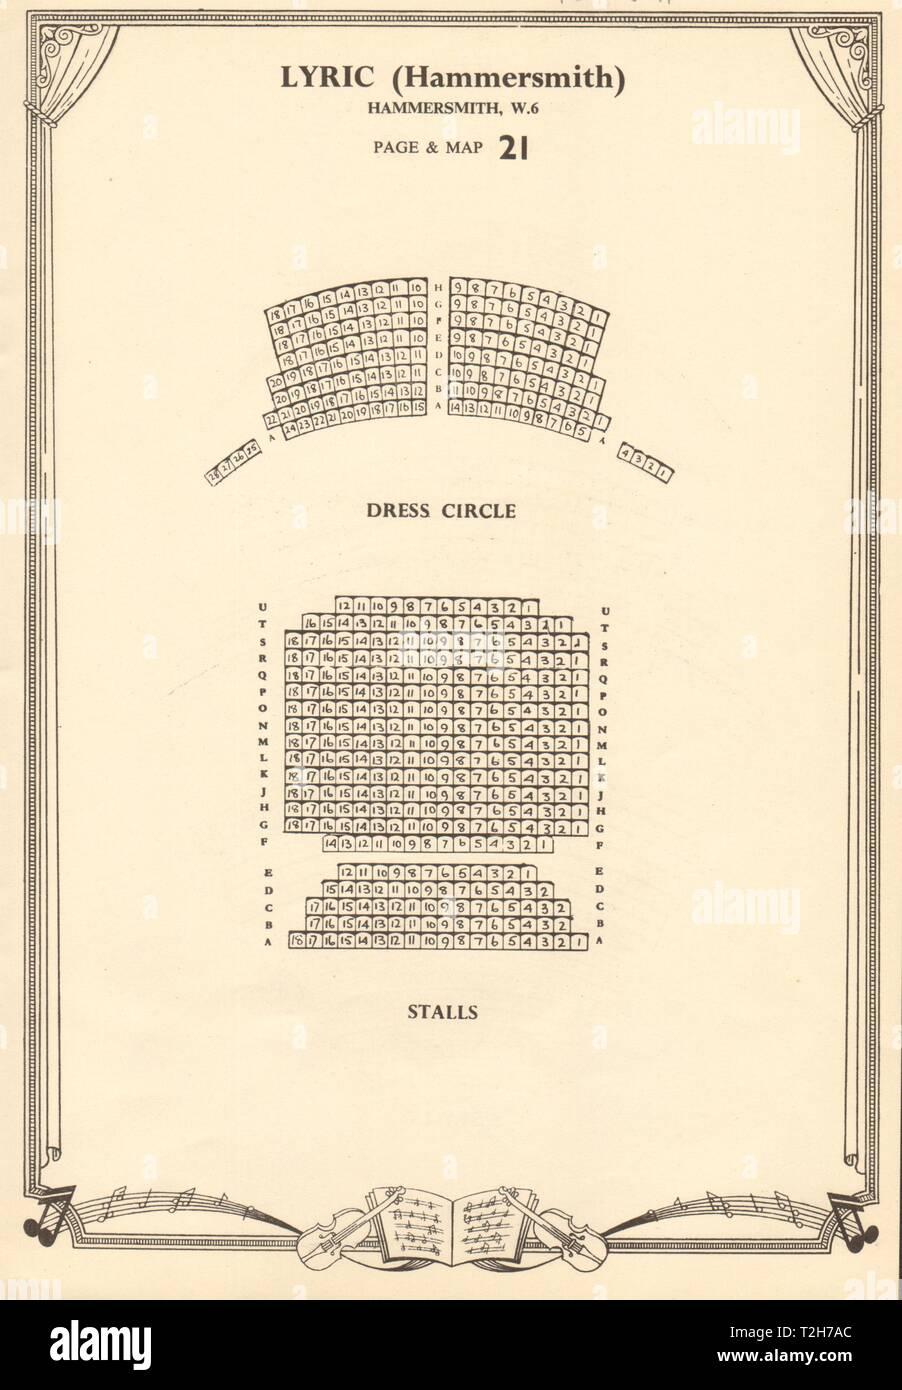 Lyric Theatre, Hammersmith, London. Vintage seating plan c1955 old print - Stock Image